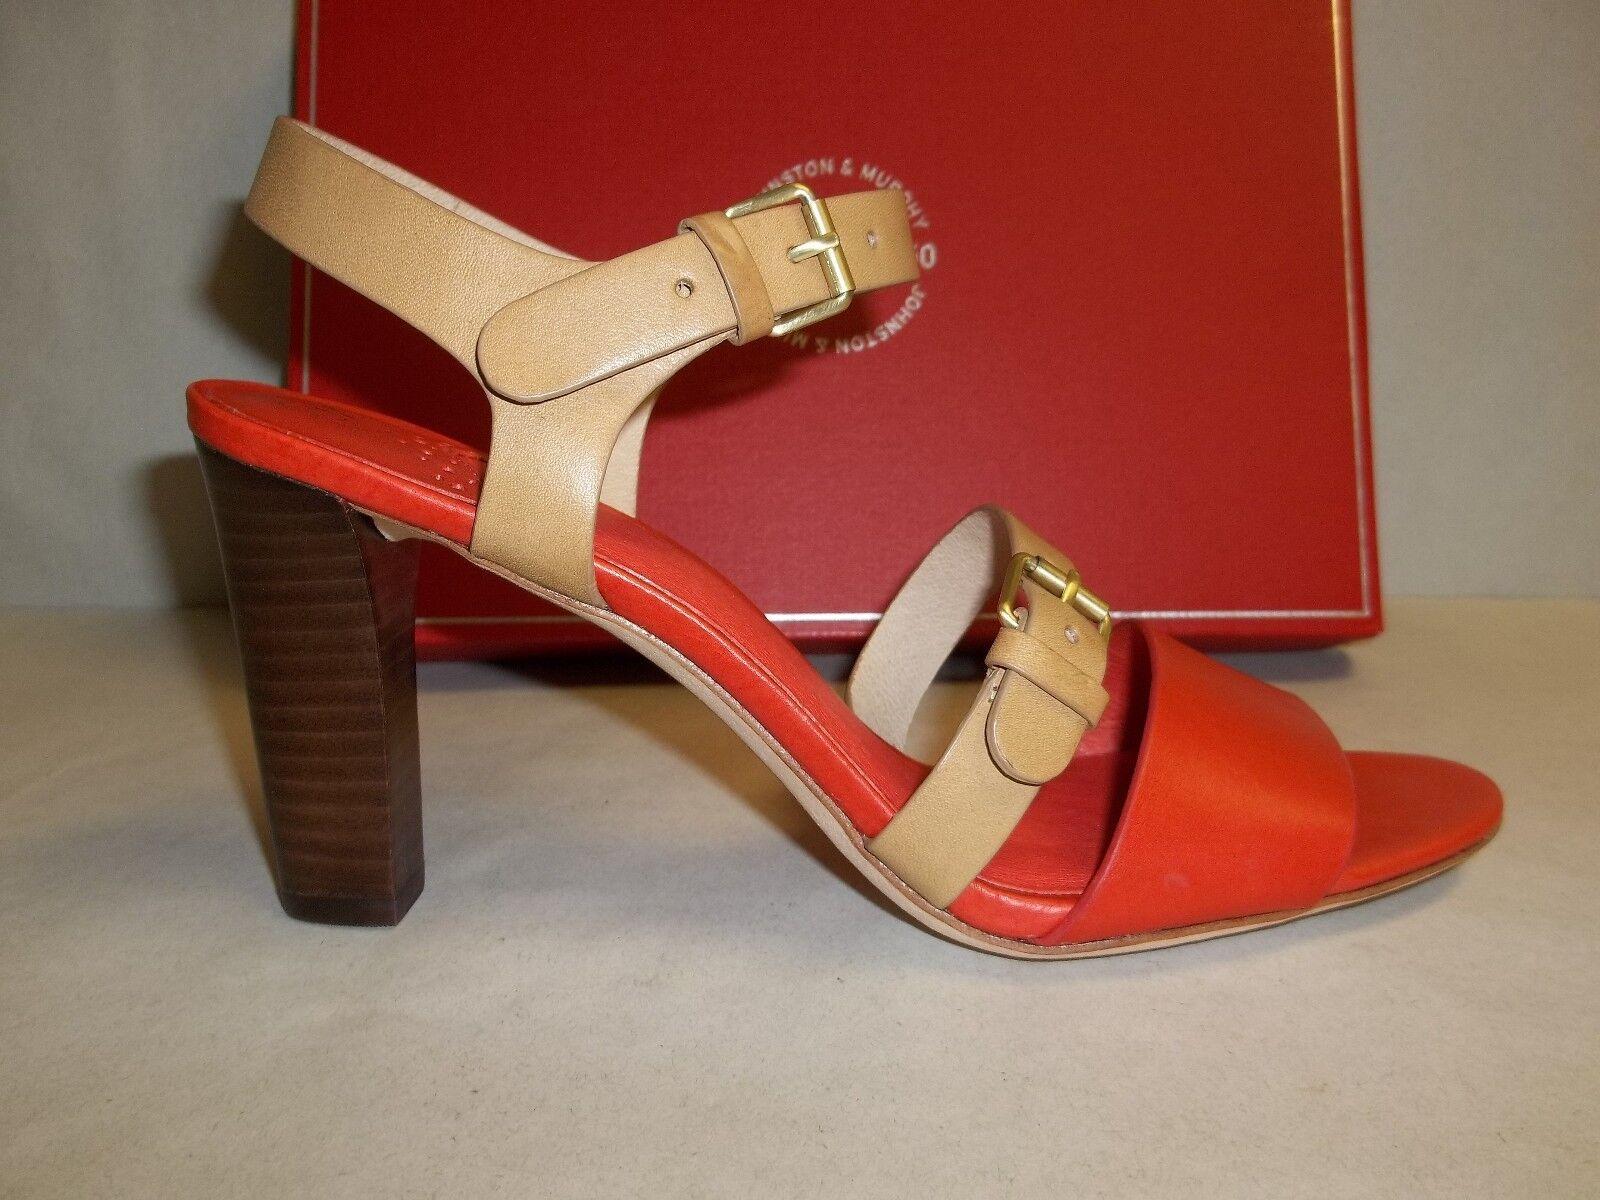 Johnston & Murphy Size 8 M LANEY QUARTER STRAP Leather Sandals New Womens shoes